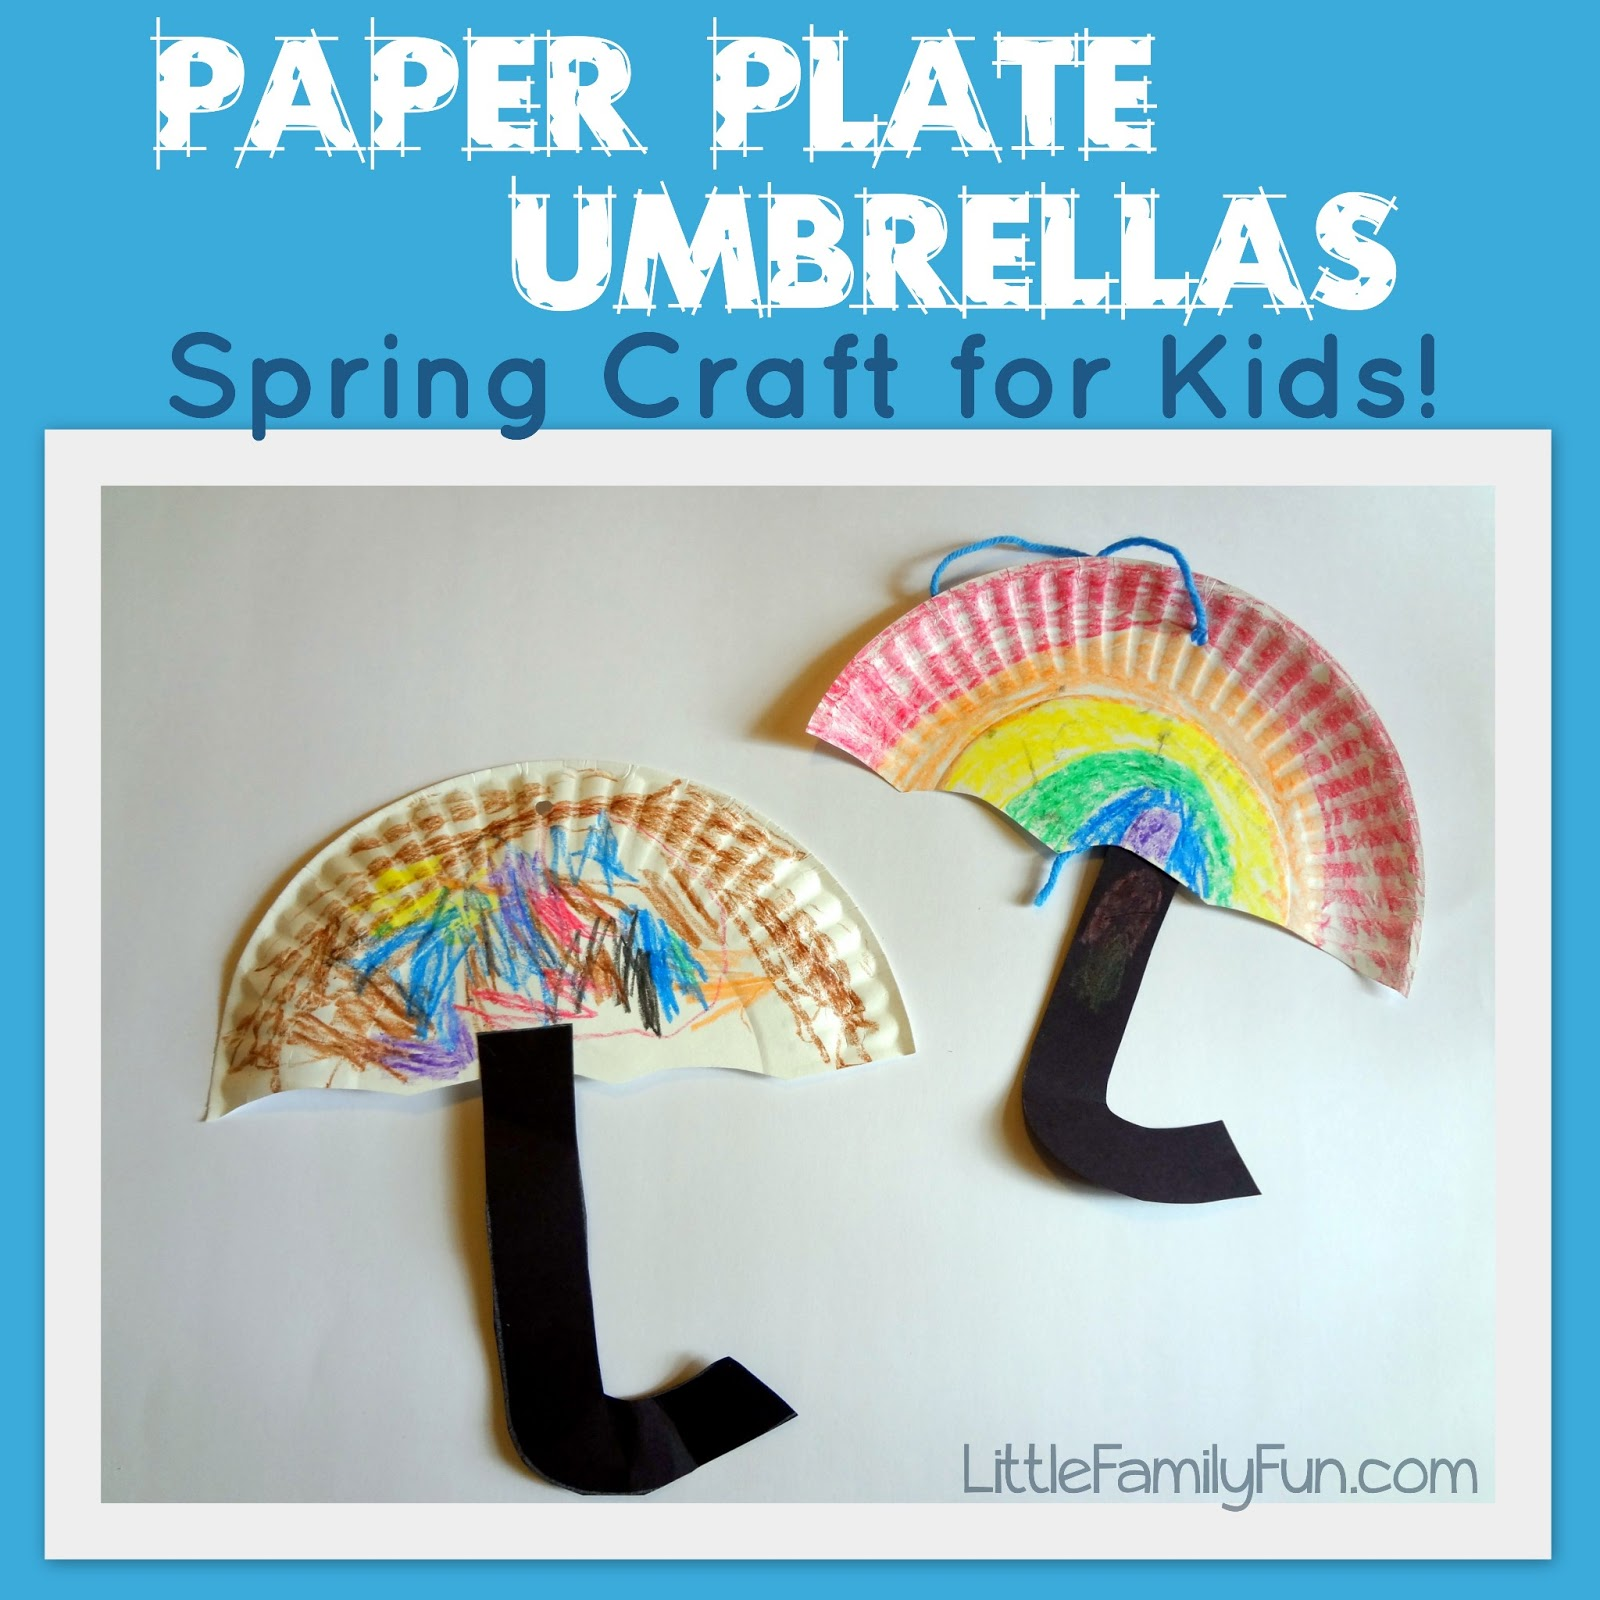 Little Family Fun: Paper Plate Umbrellas - Spring Craft ...